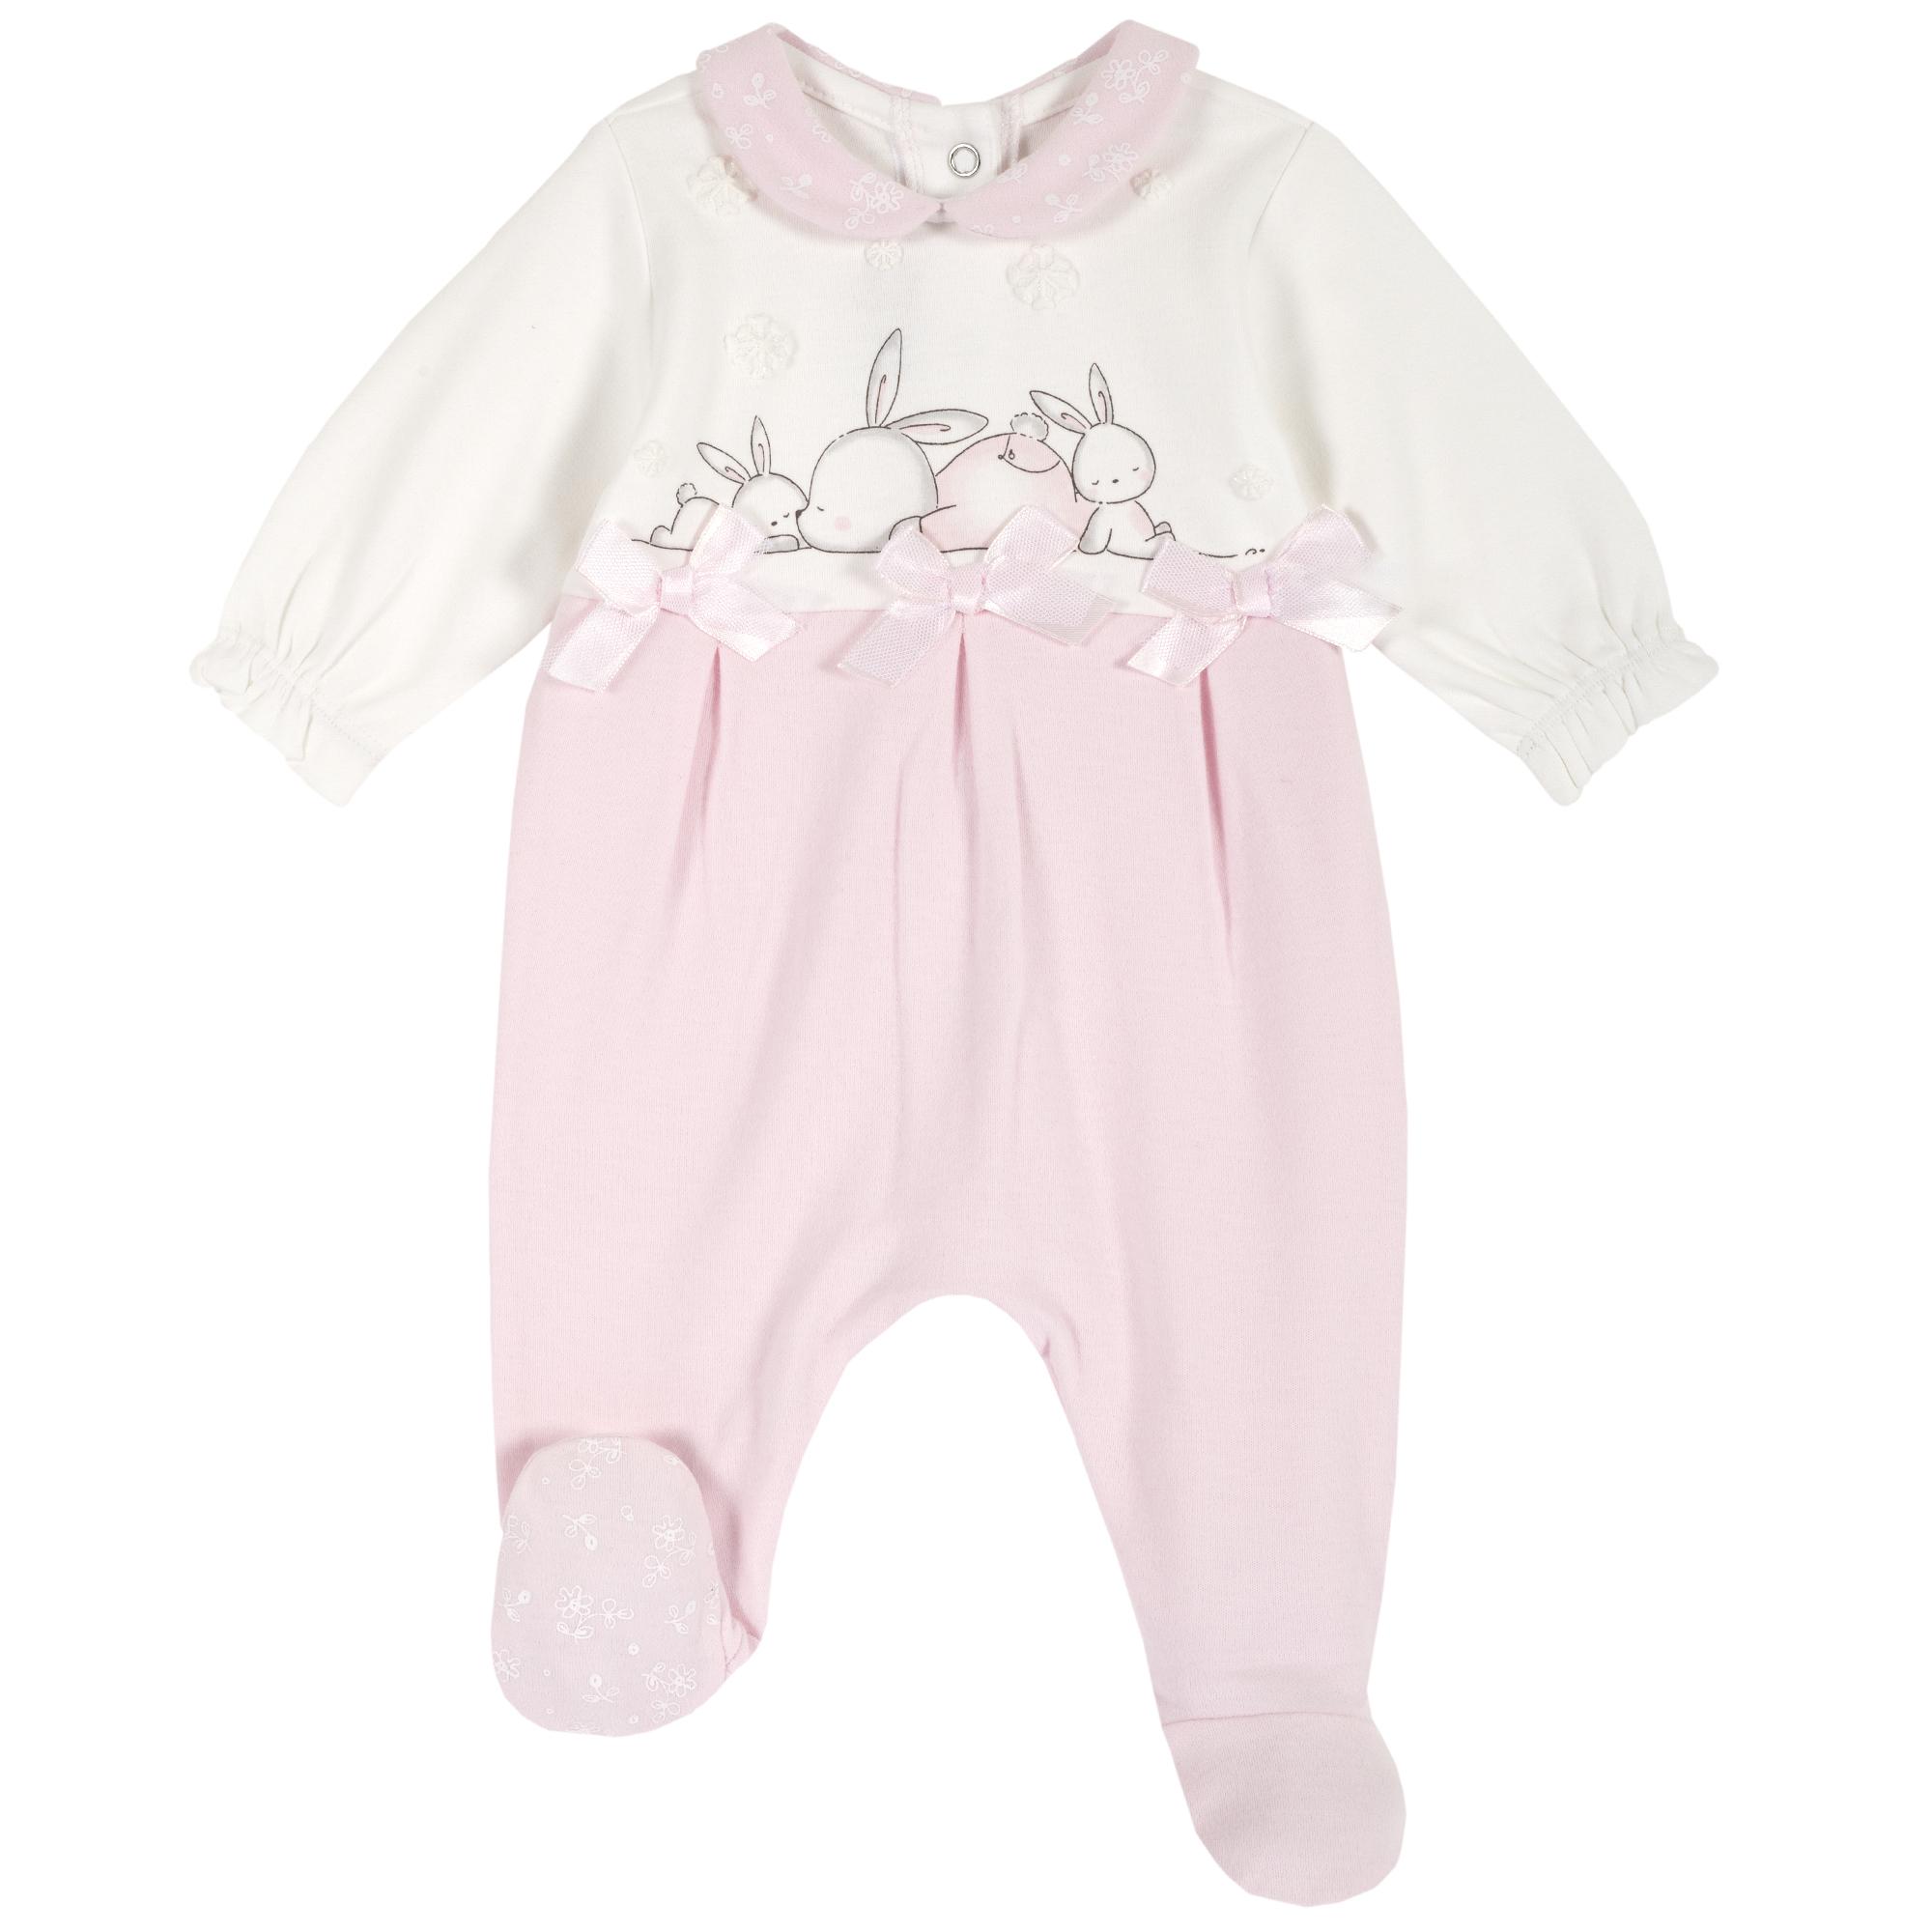 Salopeta bebe Chicco, botosei si fundite, roz, 21846